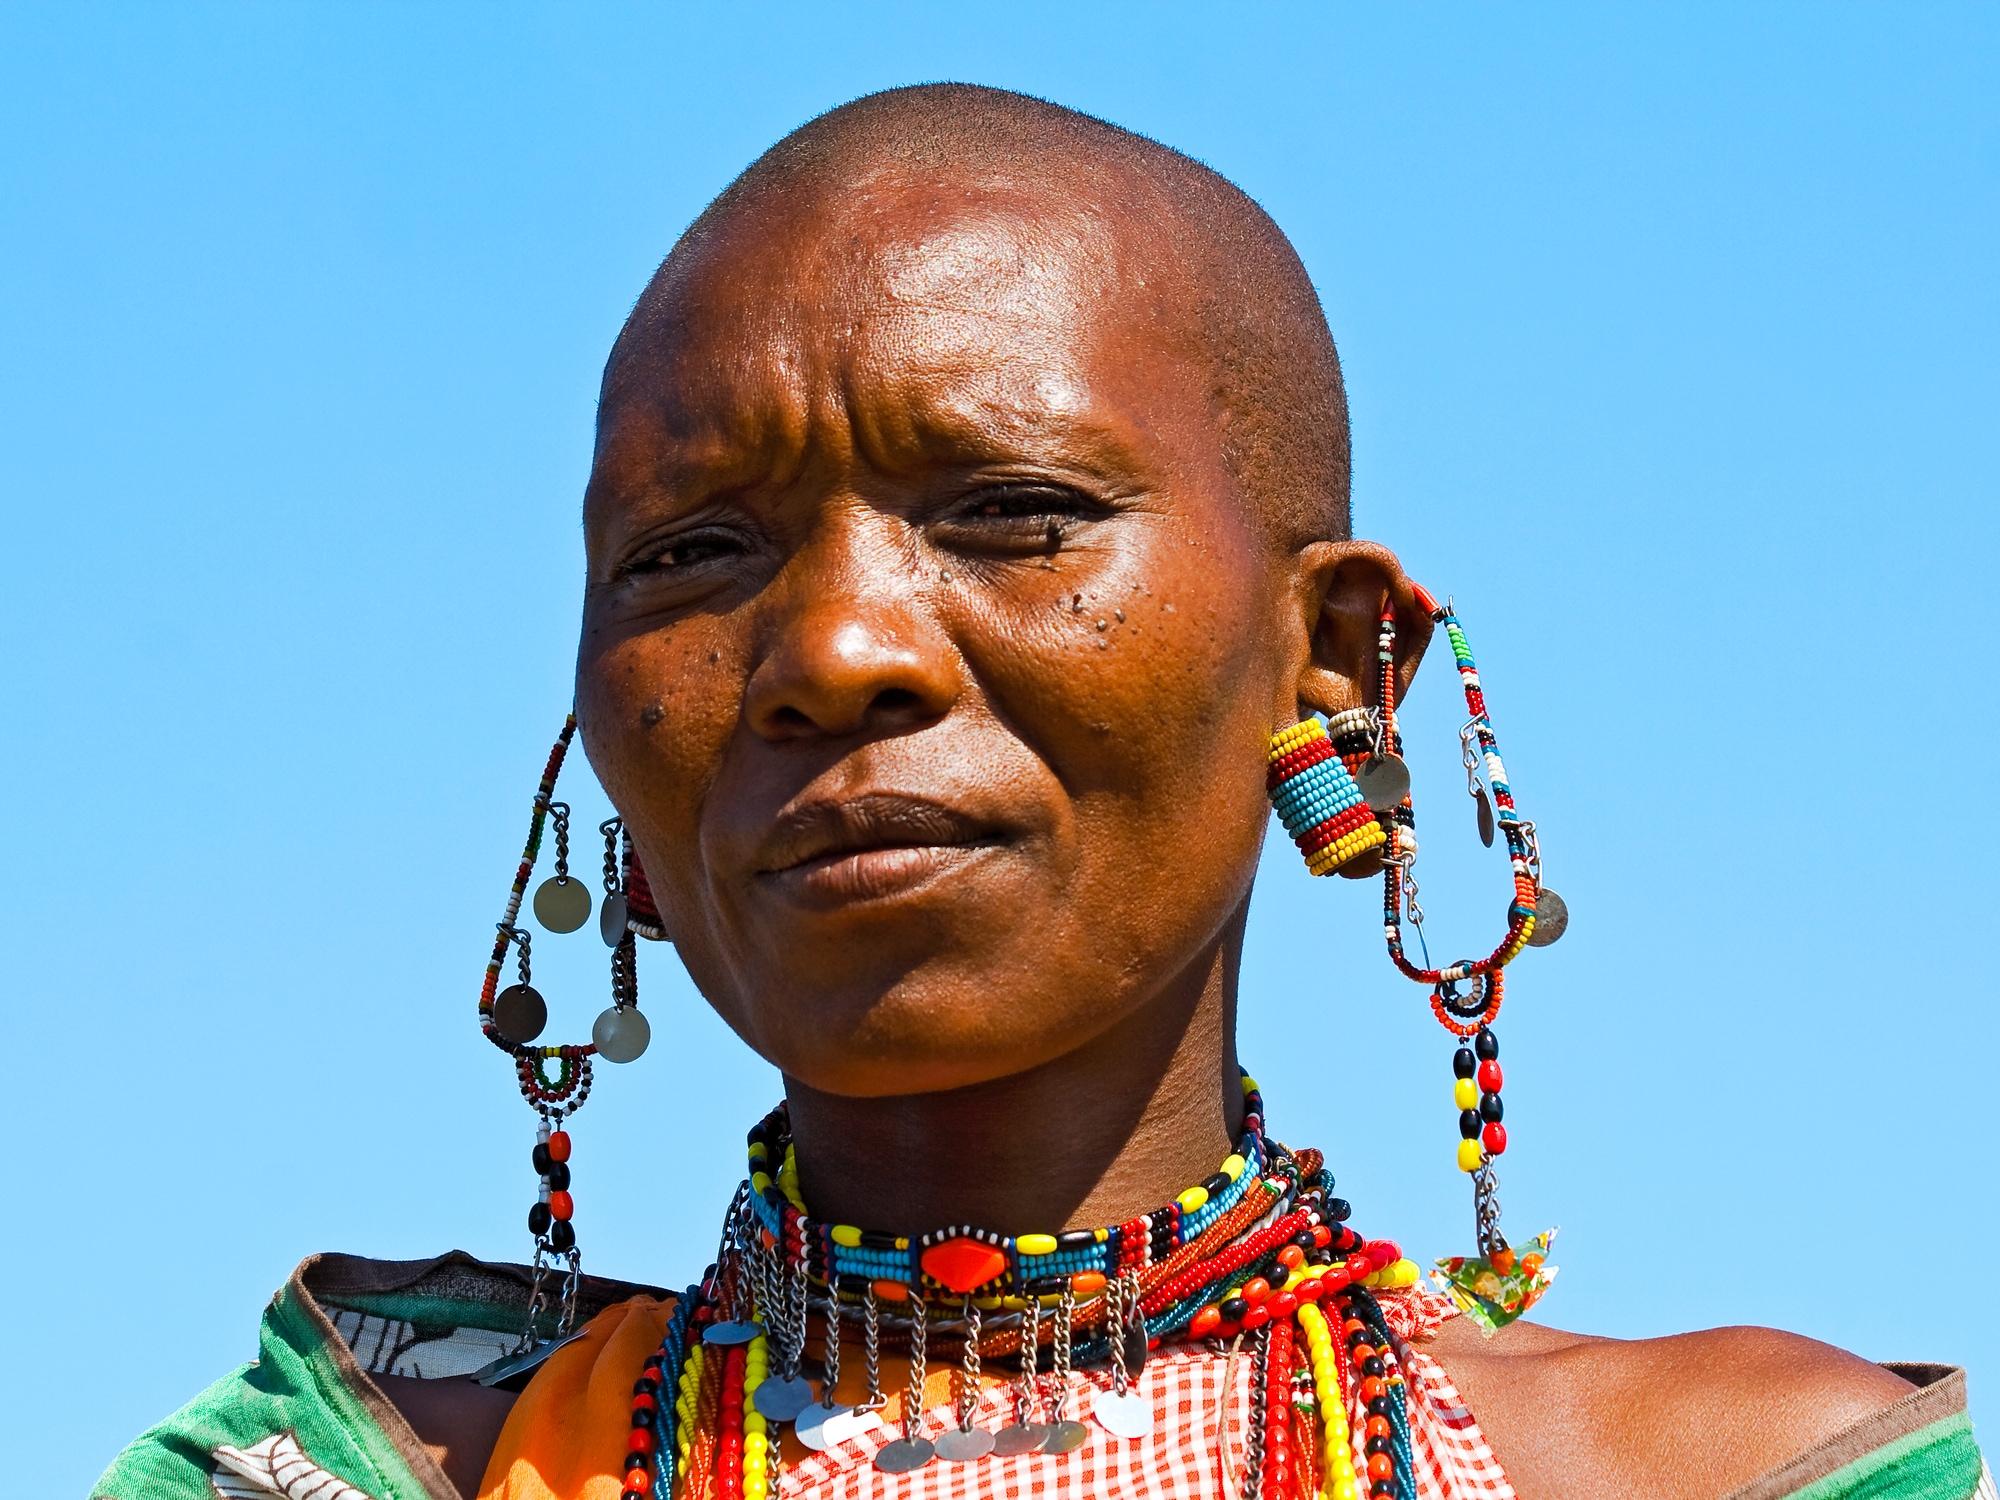 Rencontre en Tanzanie, culture et safari